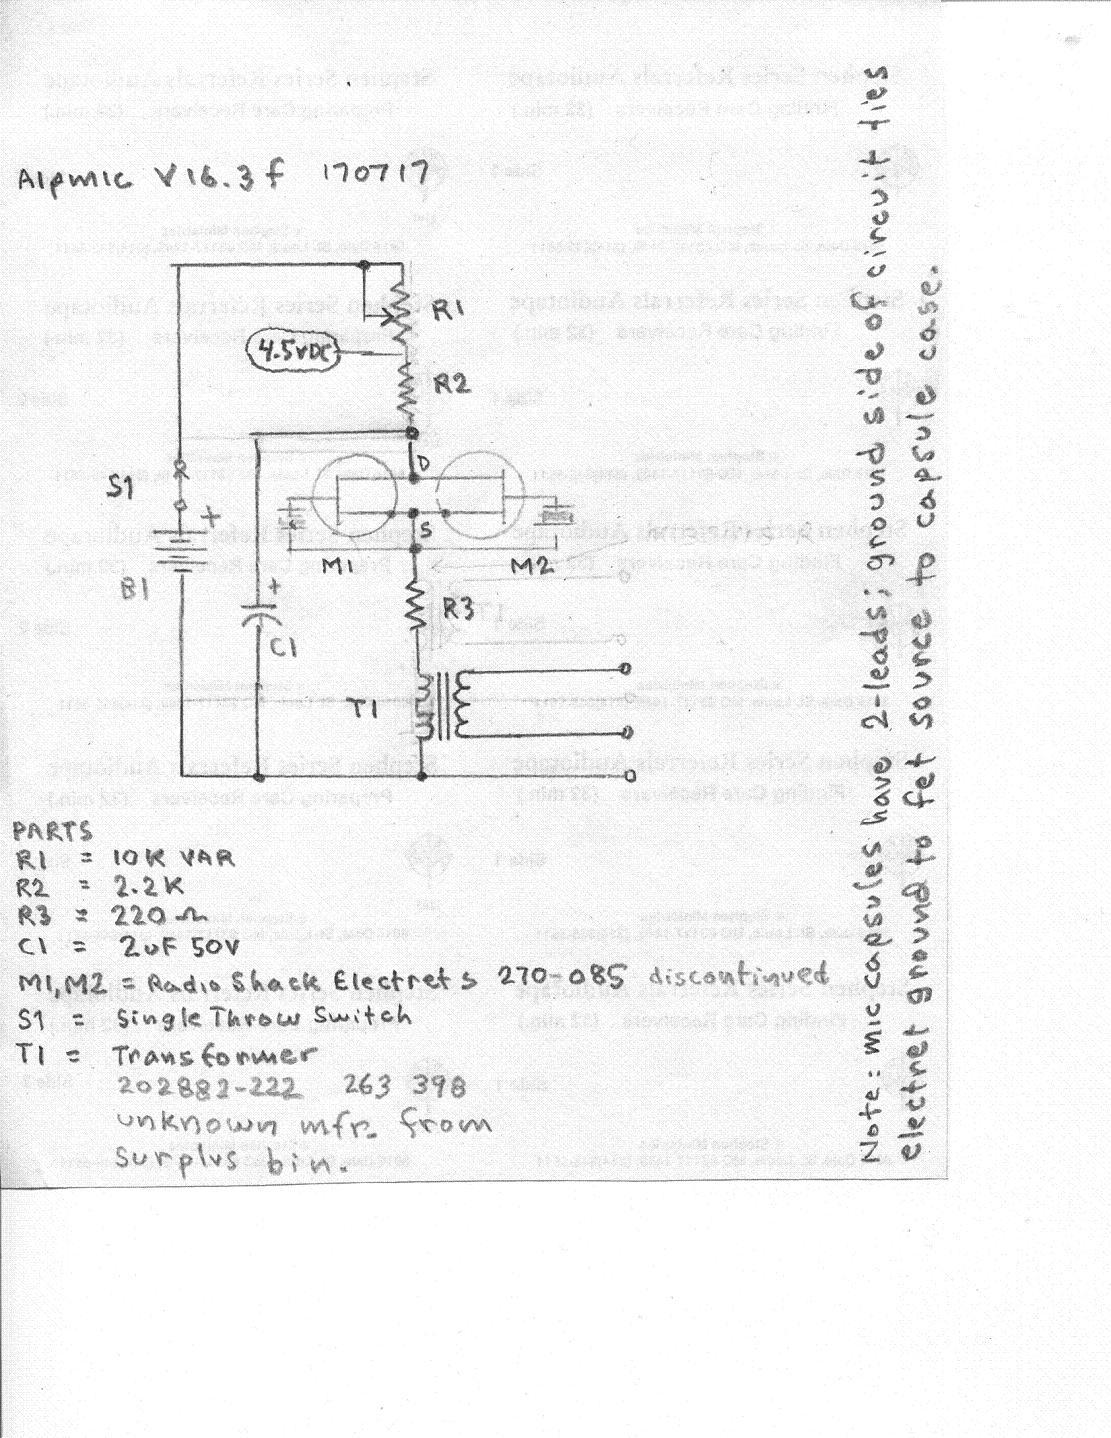 AlpmicV16_3f